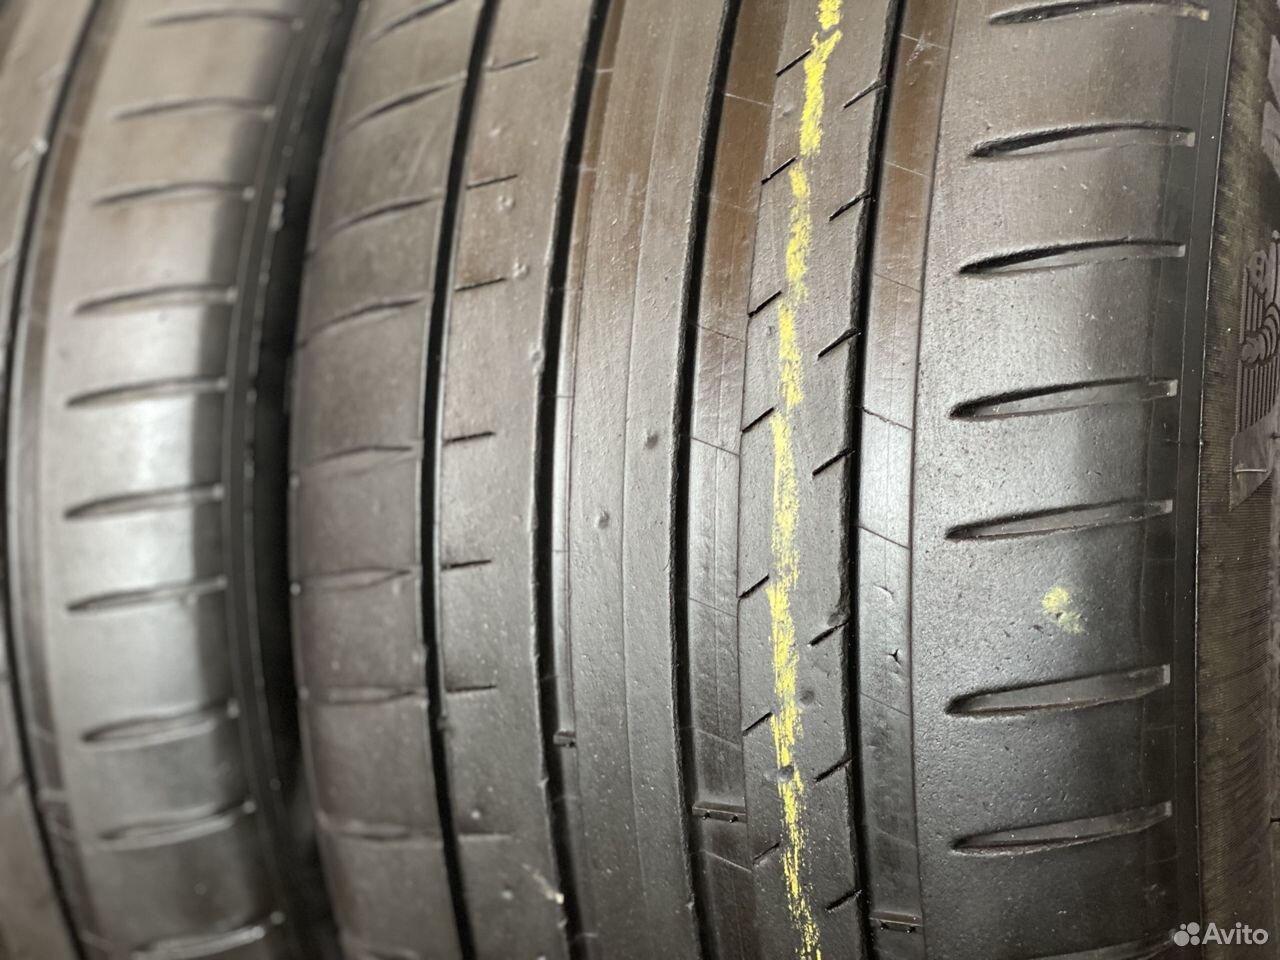 89380001718  255/45/18 Michelin Pilot Sport 4 (5 mm)